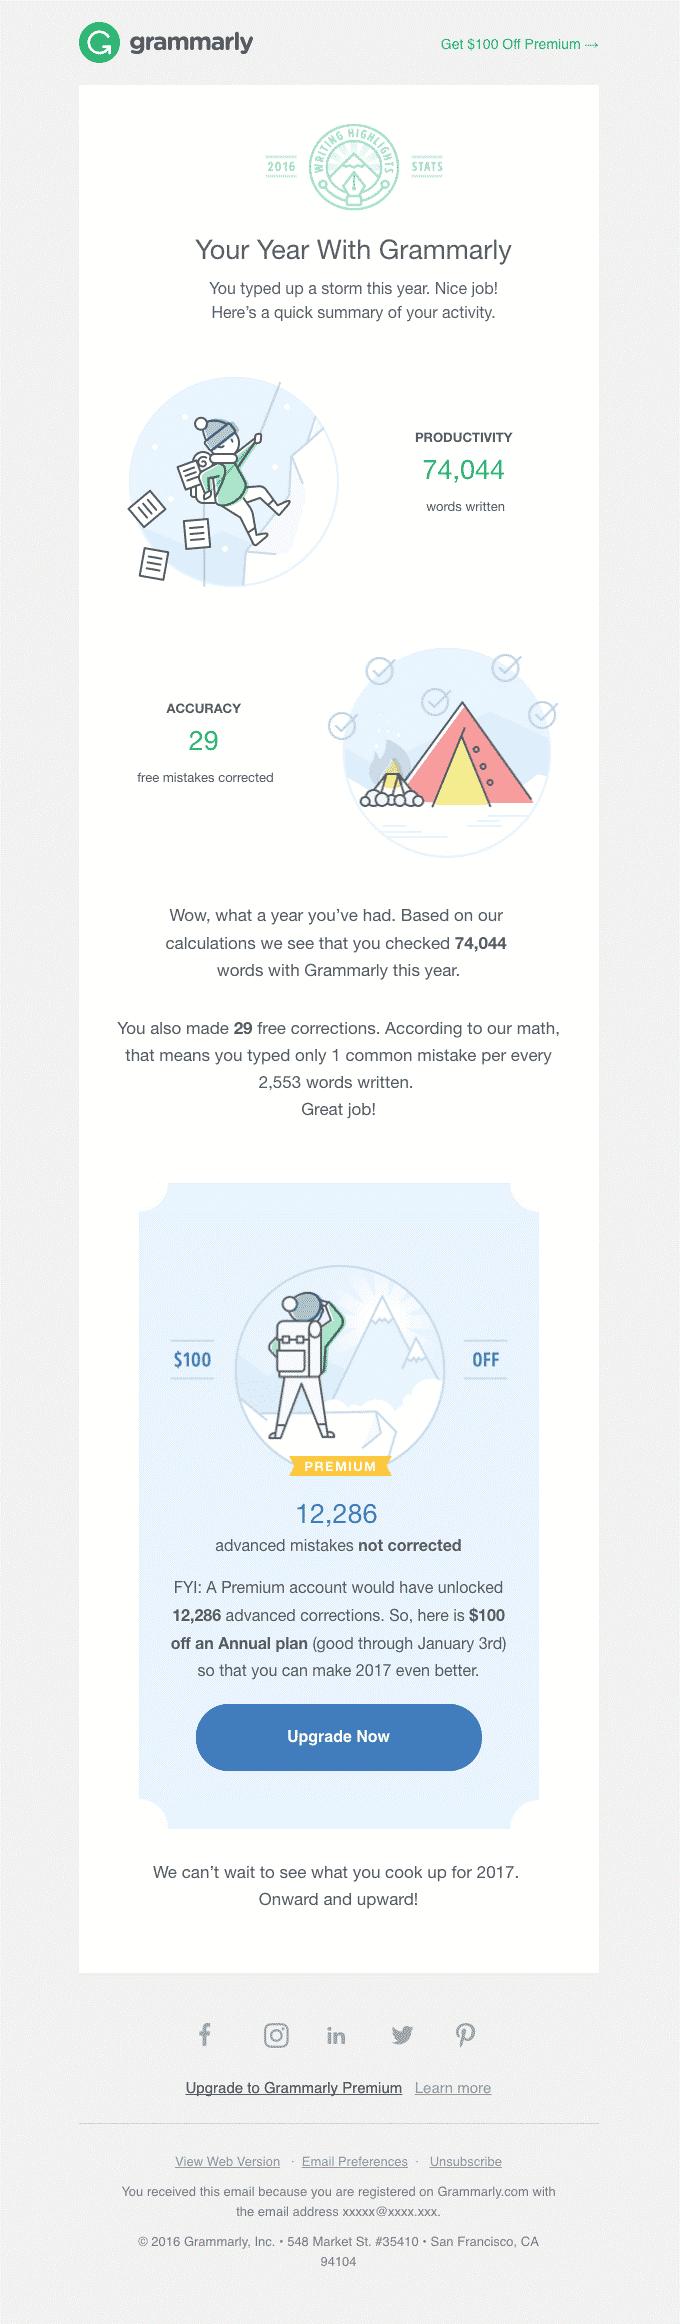 saas plan upgrade emails